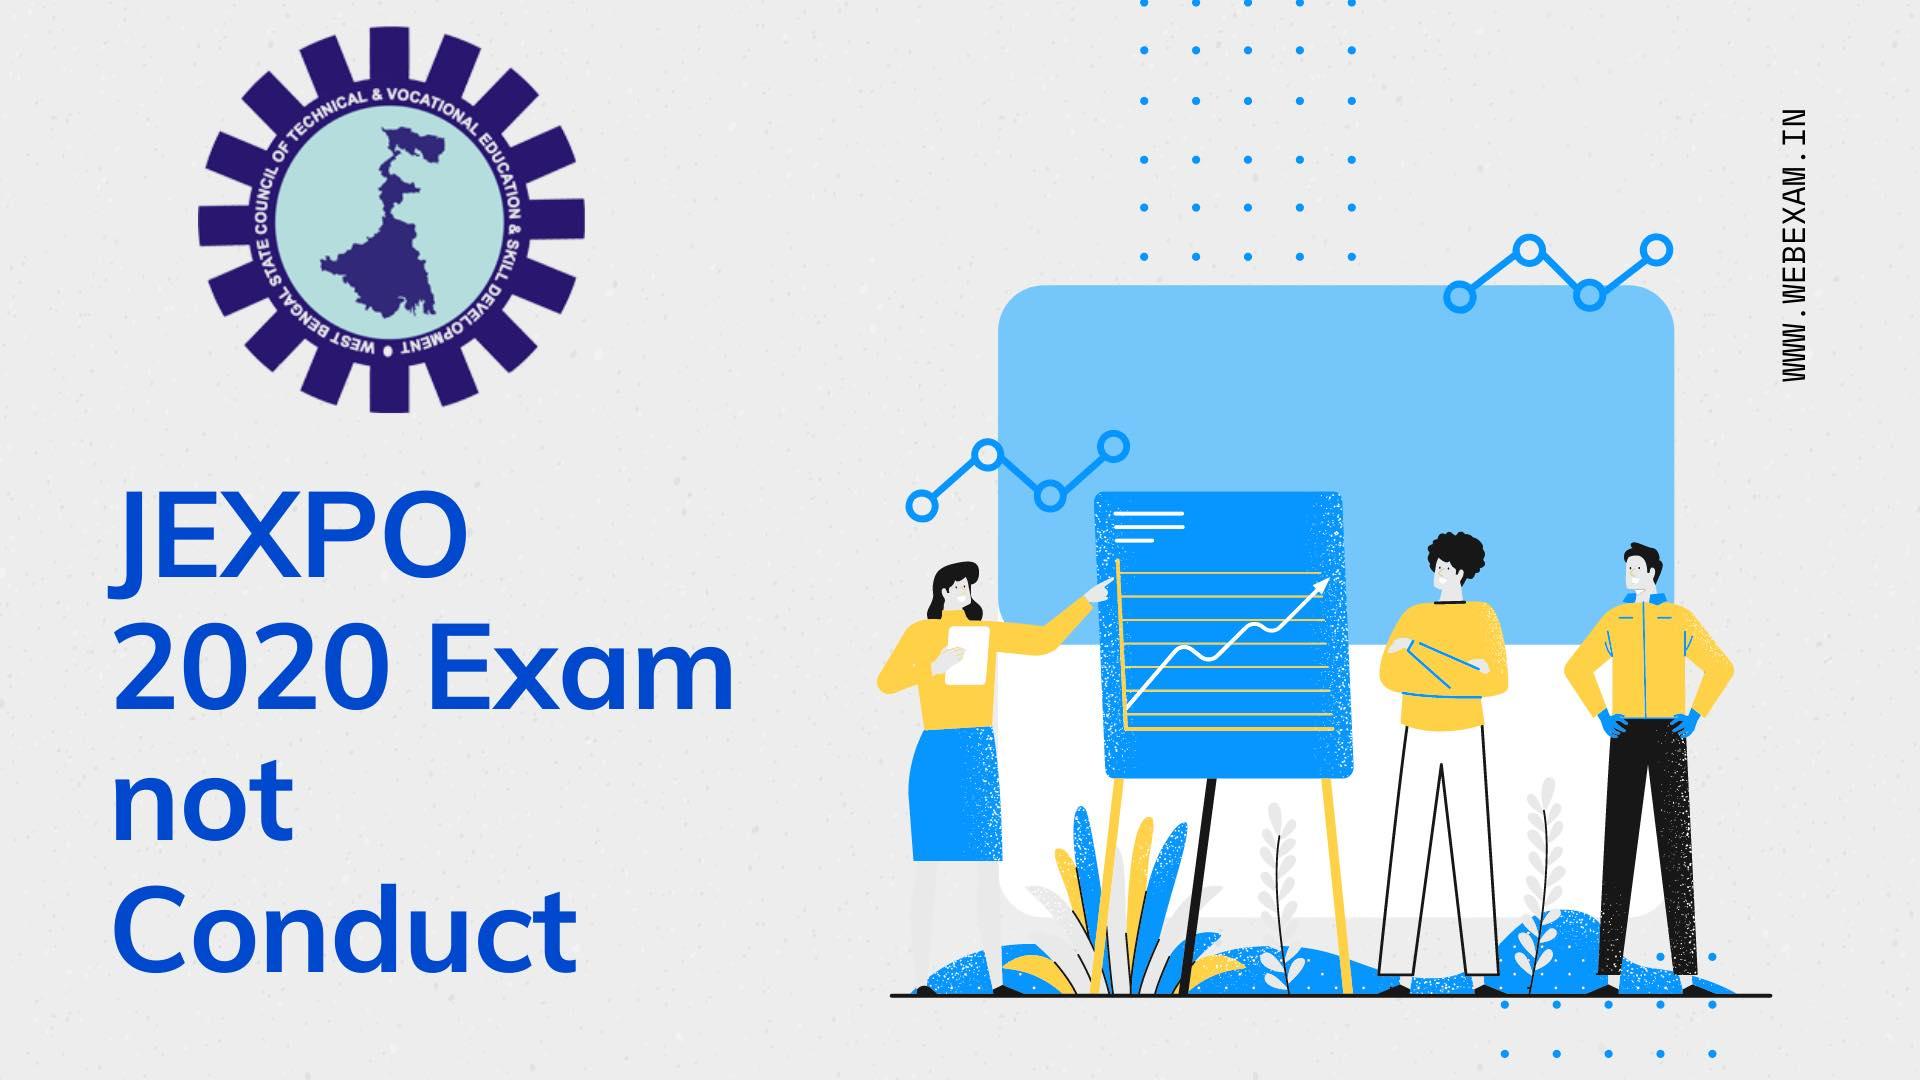 JEXPO 2020 Exam not conduct